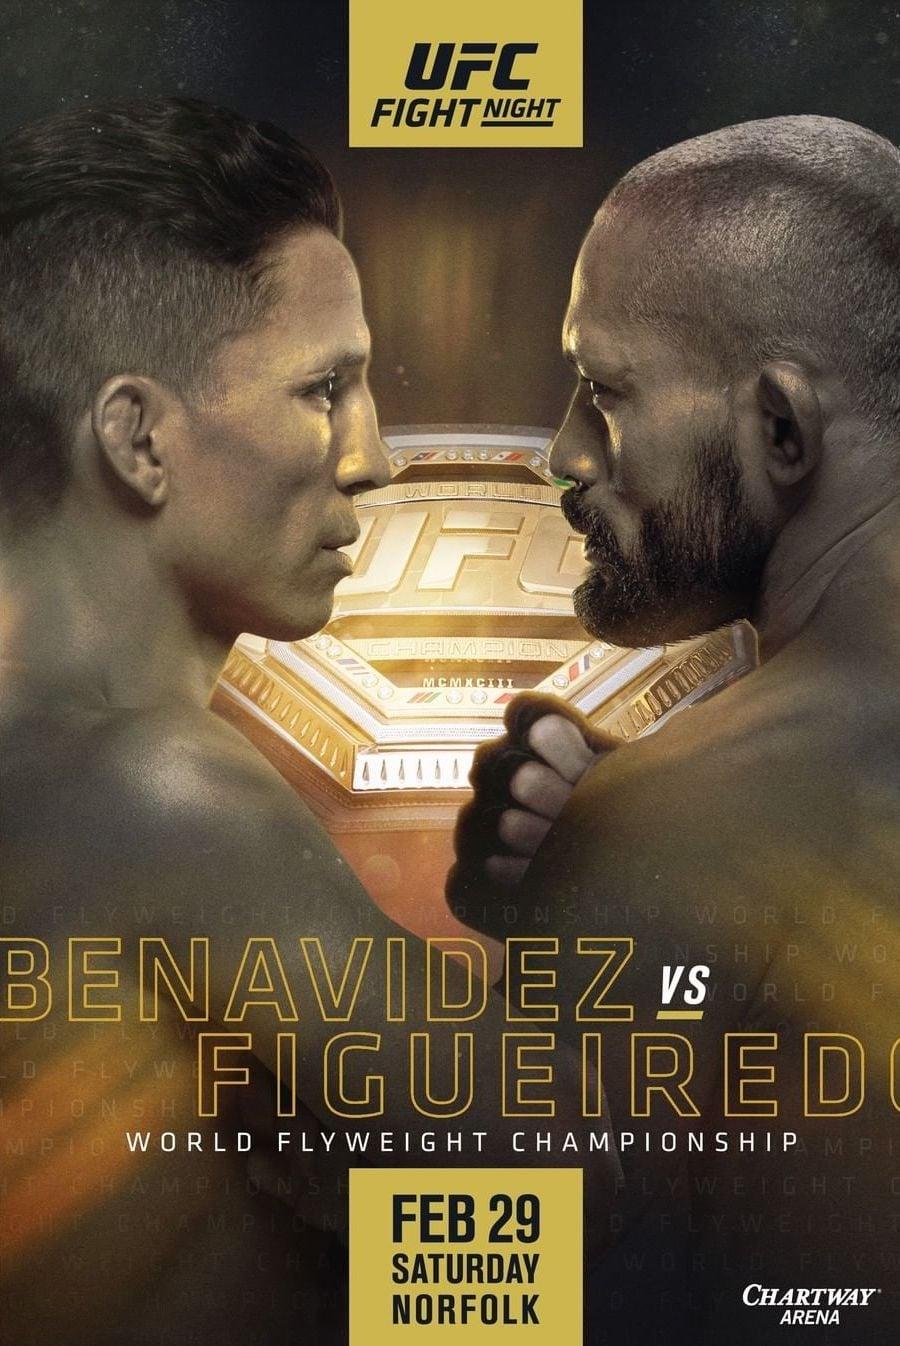 UFC Fight Night 169: Benavidez vs. Figueiredo